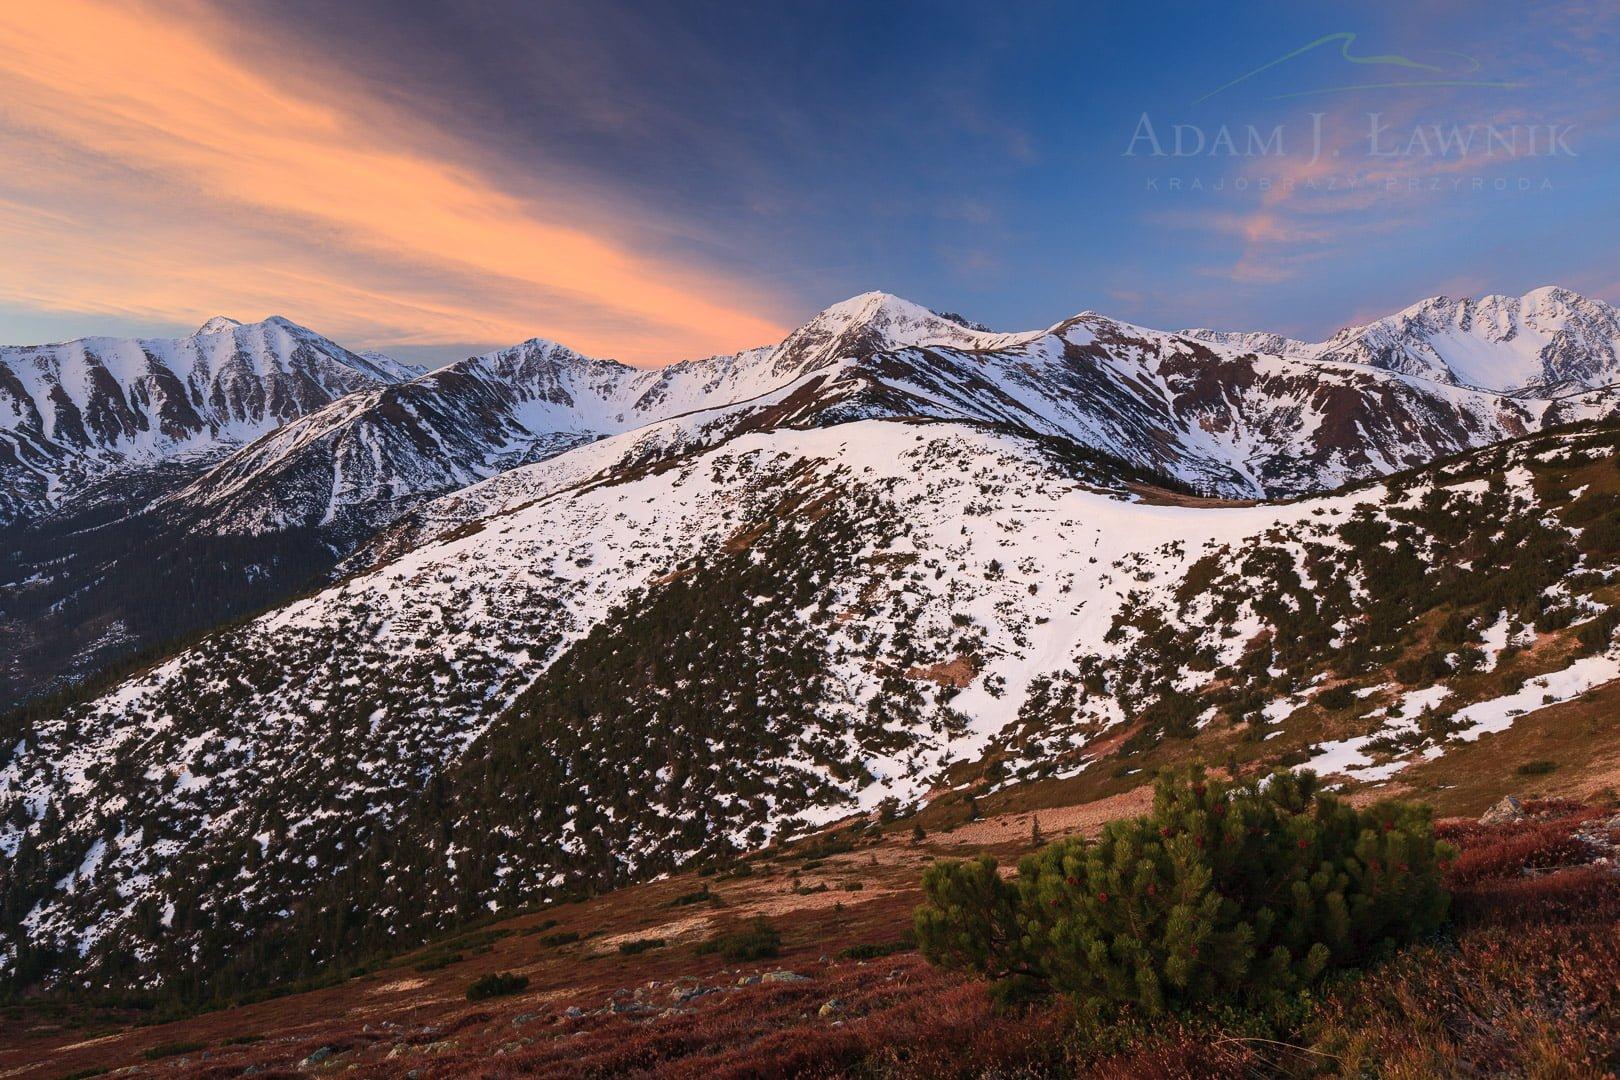 Tatra National Park, Poland 1104-00792C